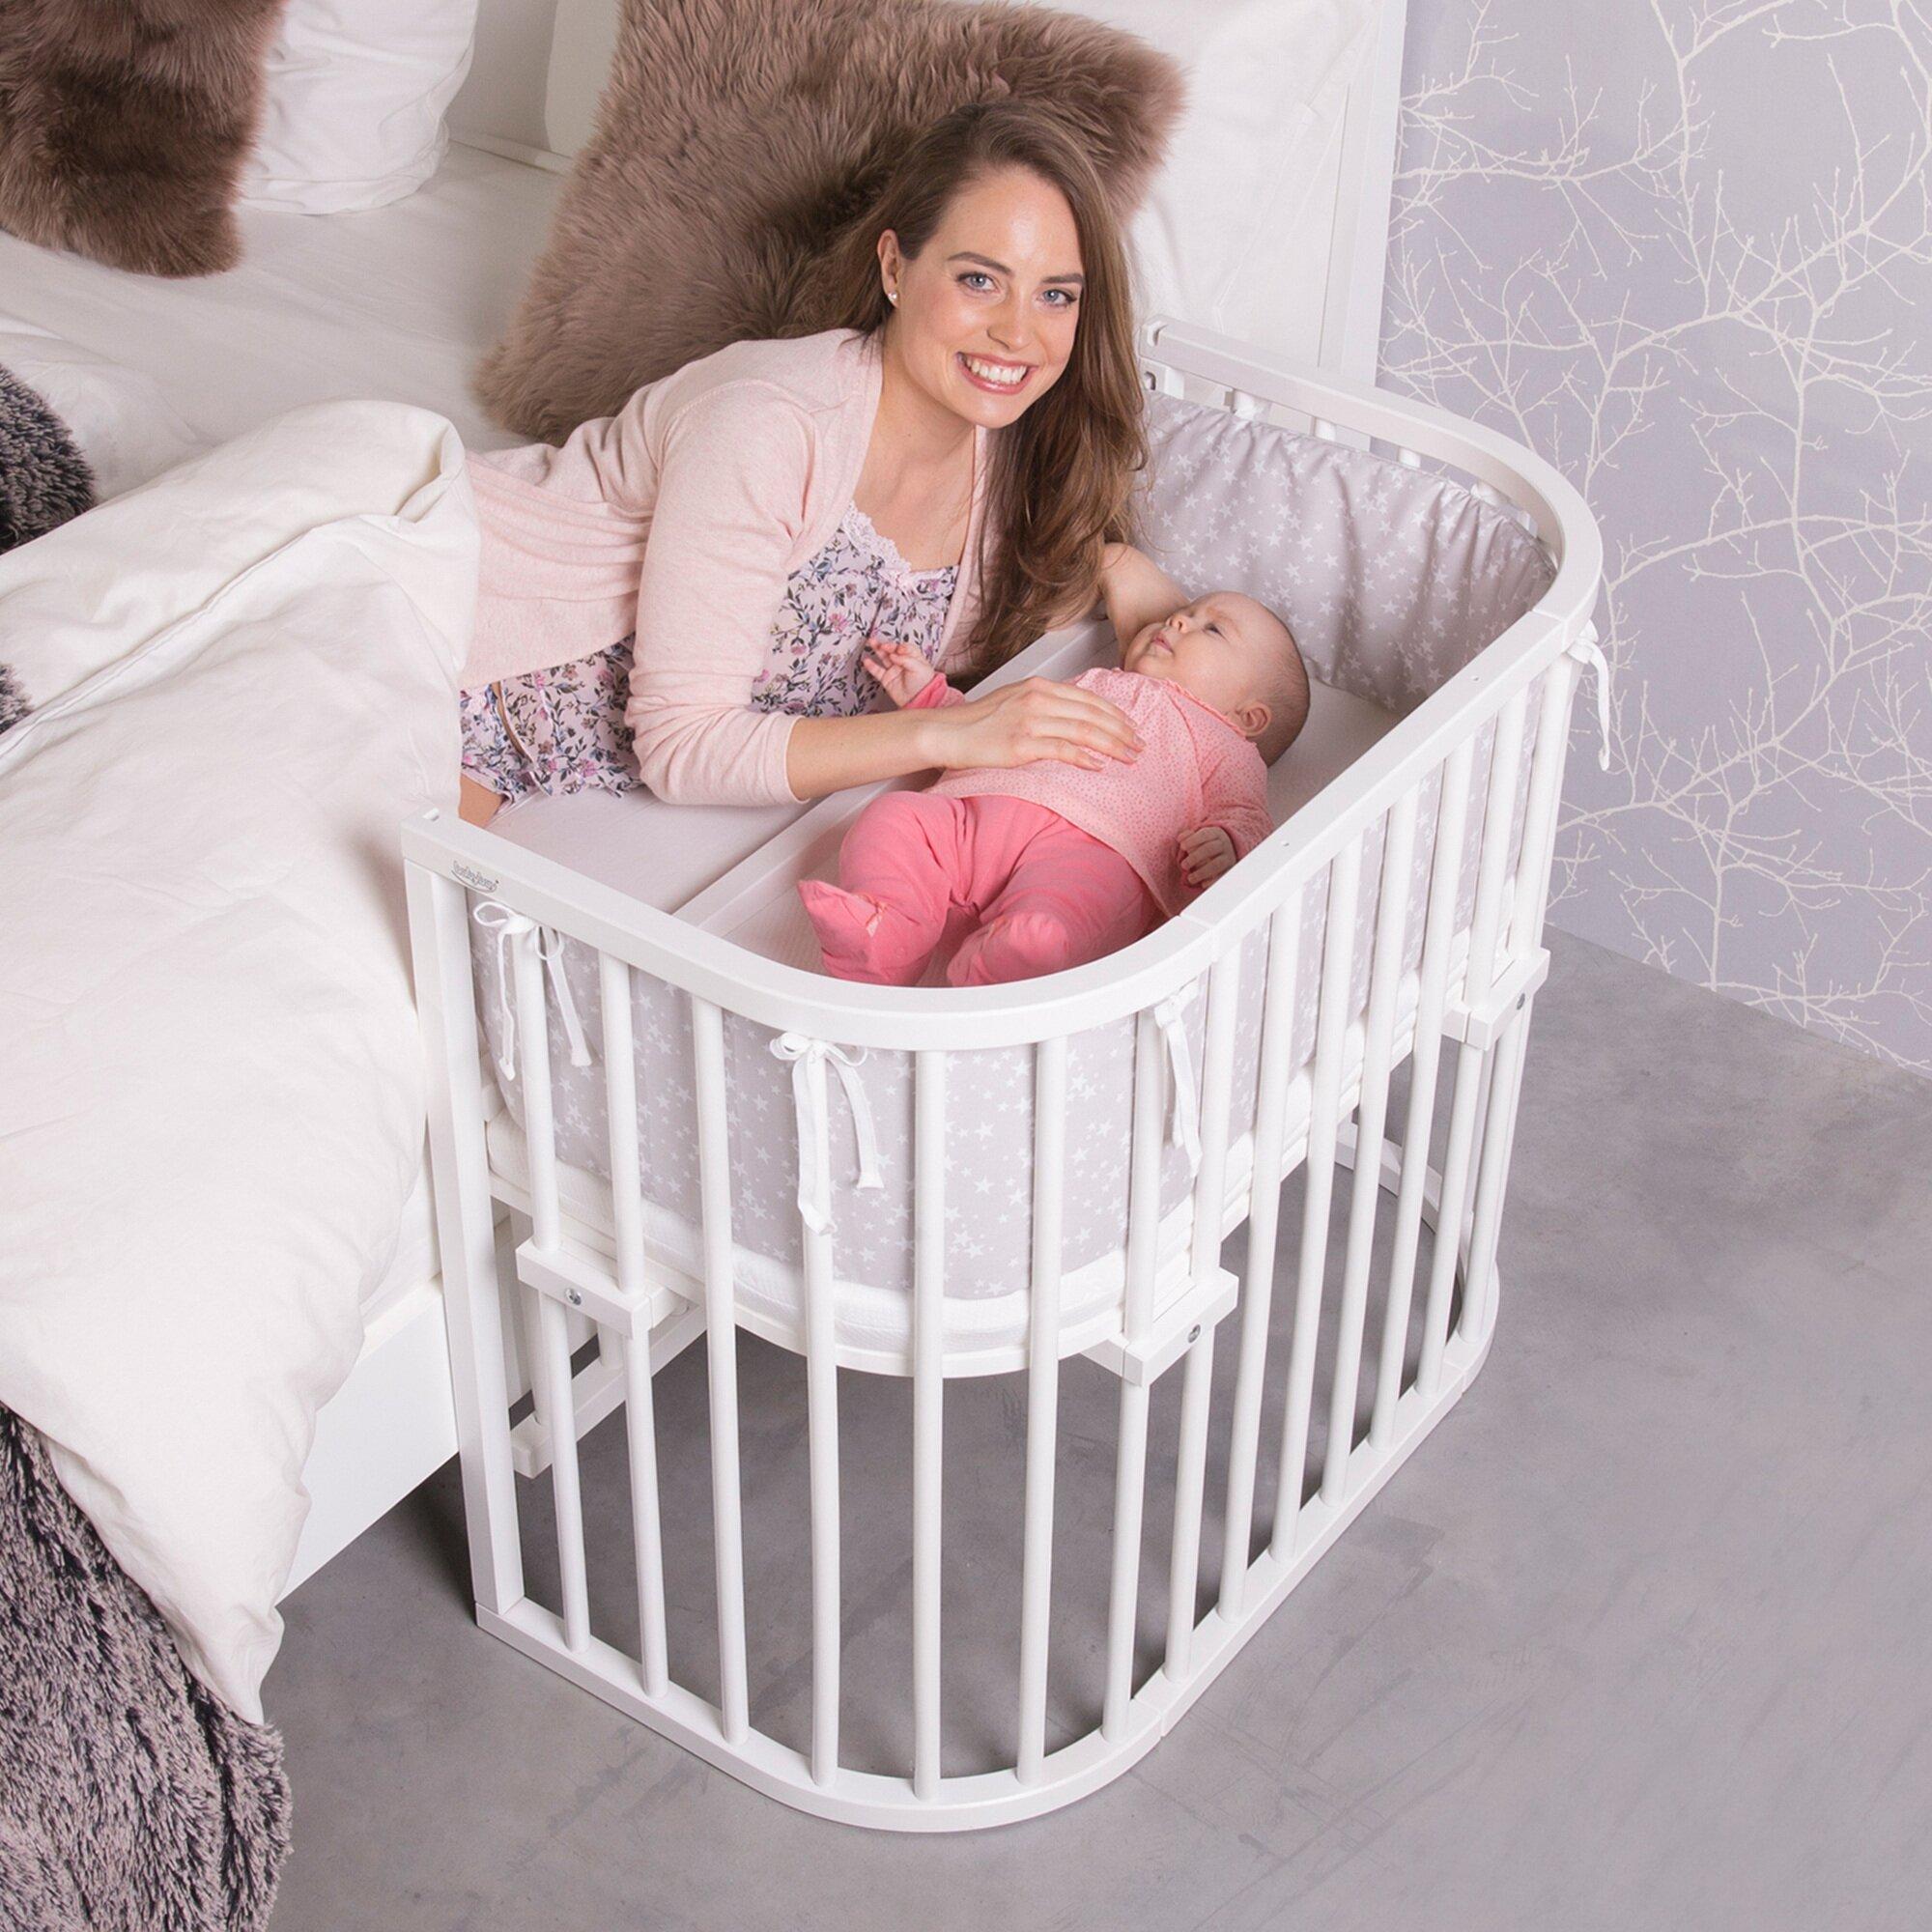 babybay-beistellbett-comfort-89x45-cm